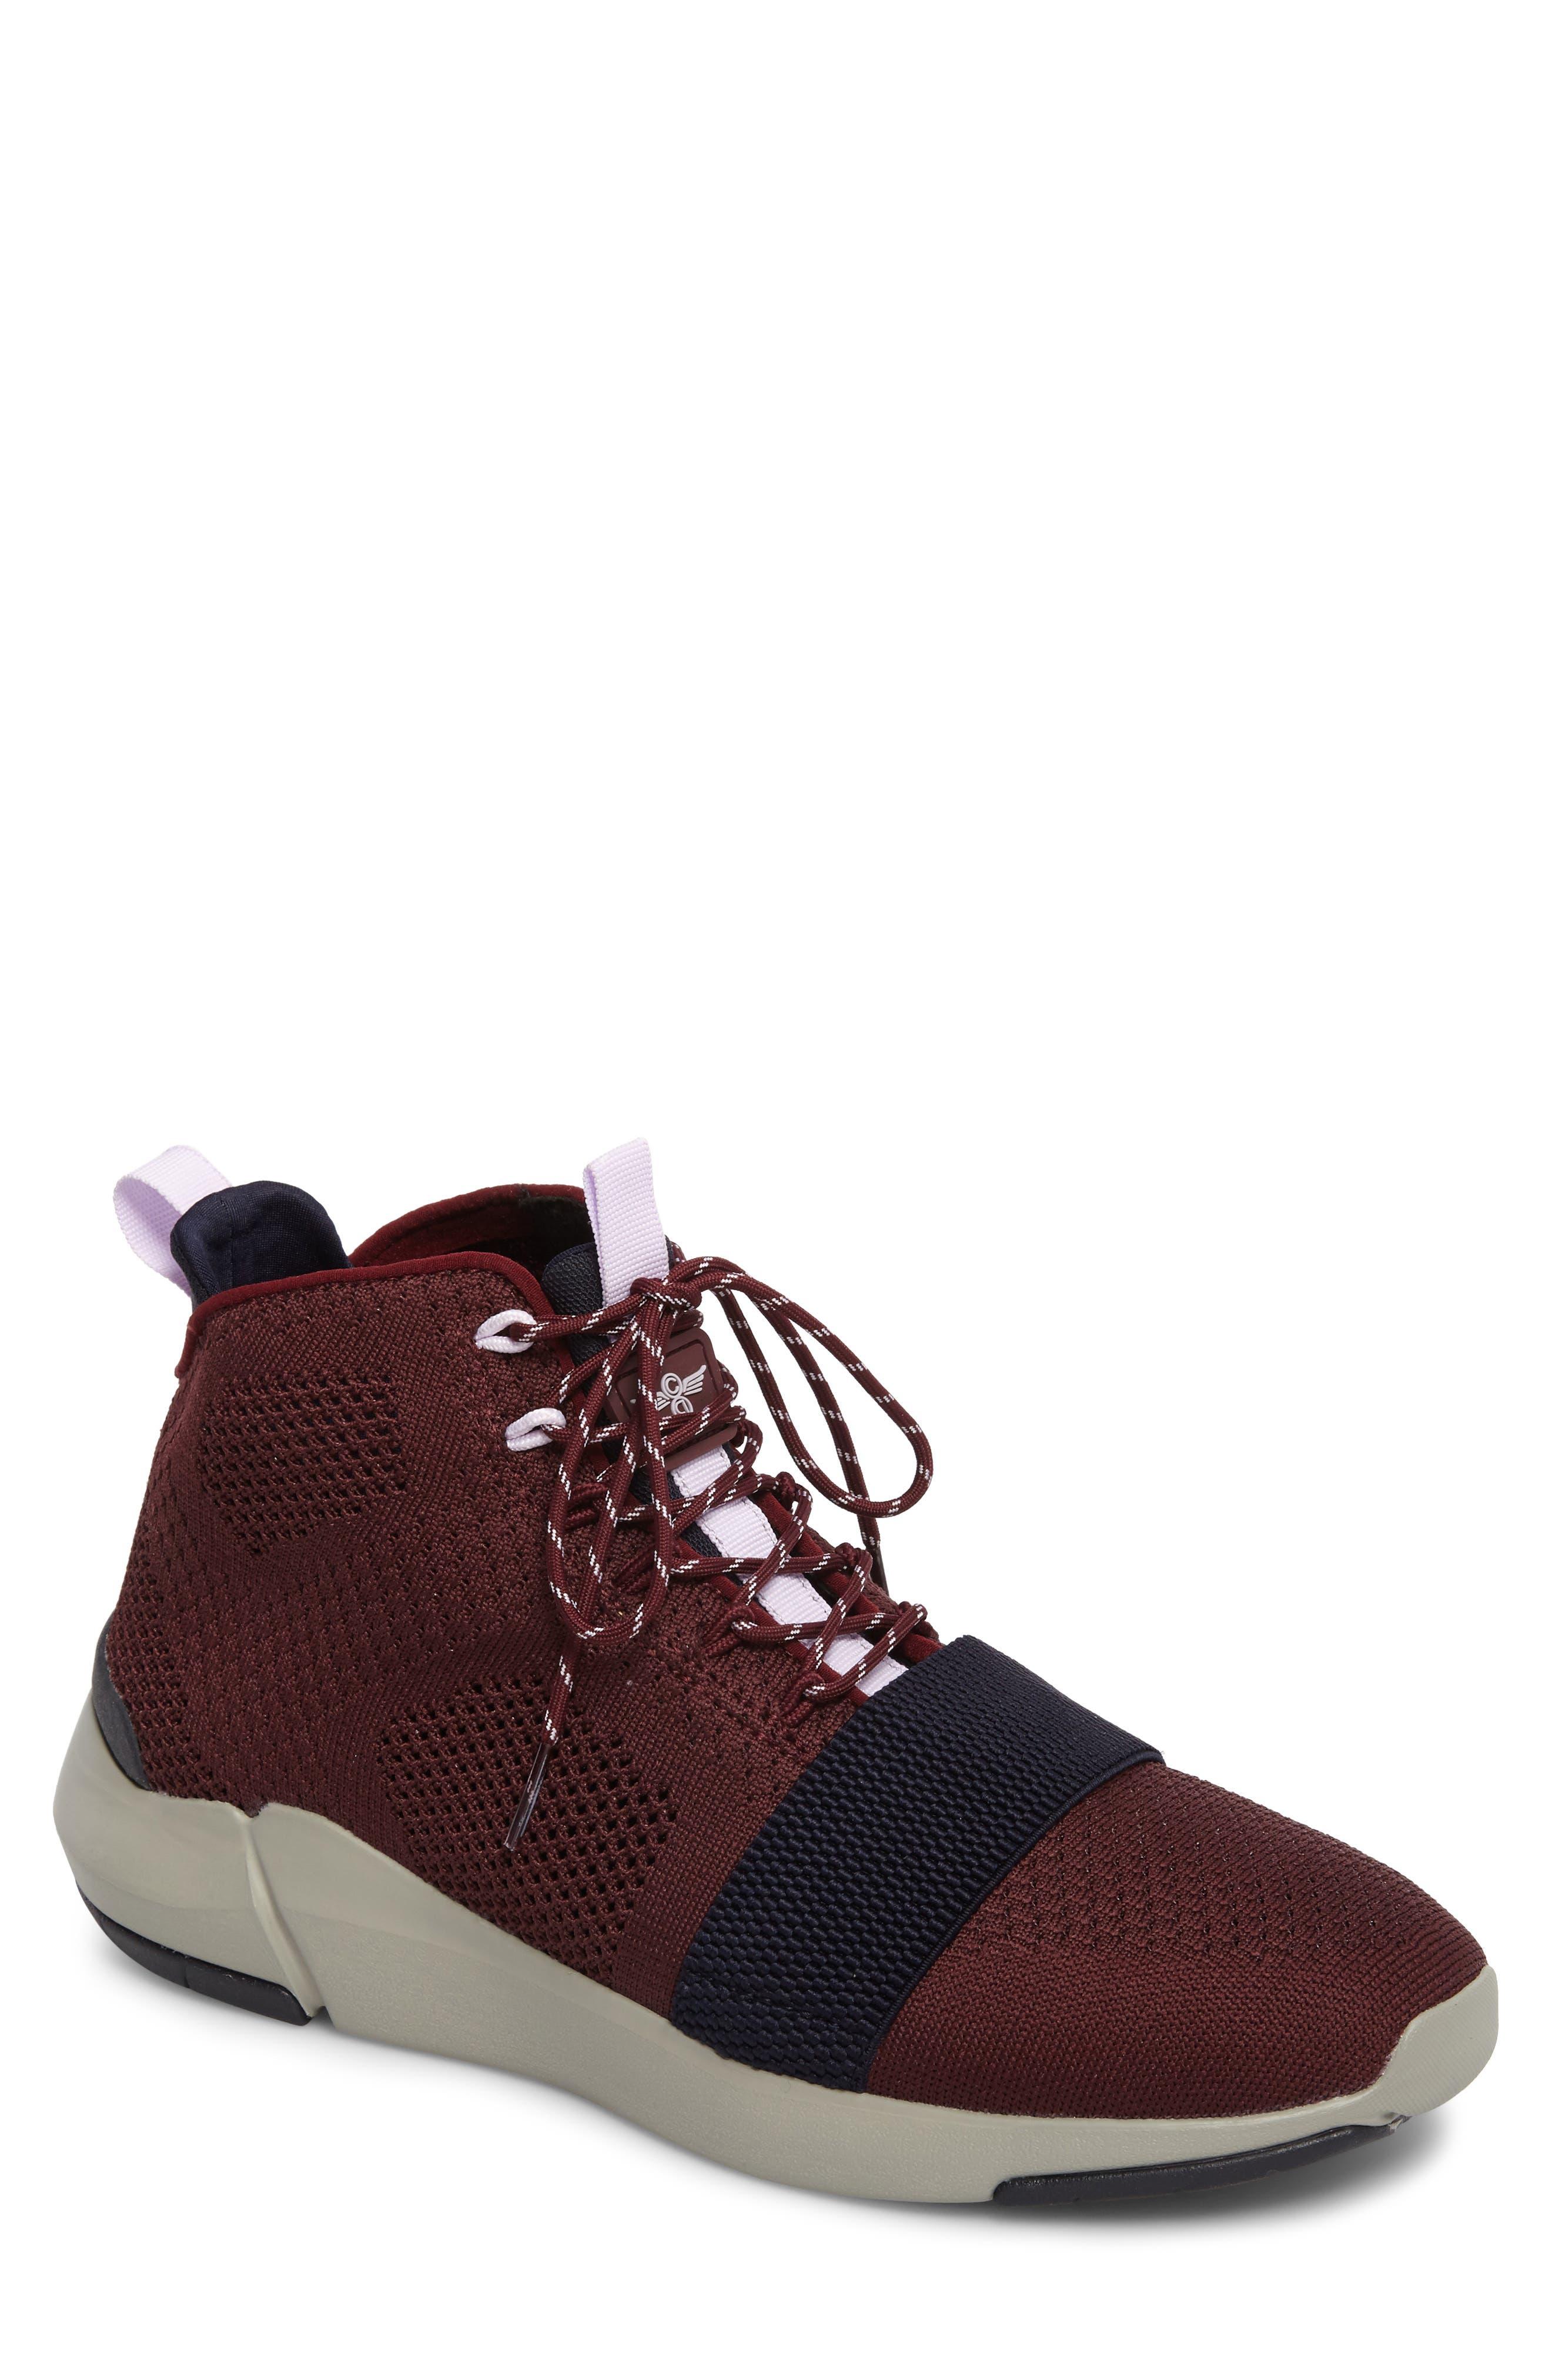 Modica Sneaker,                             Main thumbnail 1, color,                             Dark Burgundy Navy